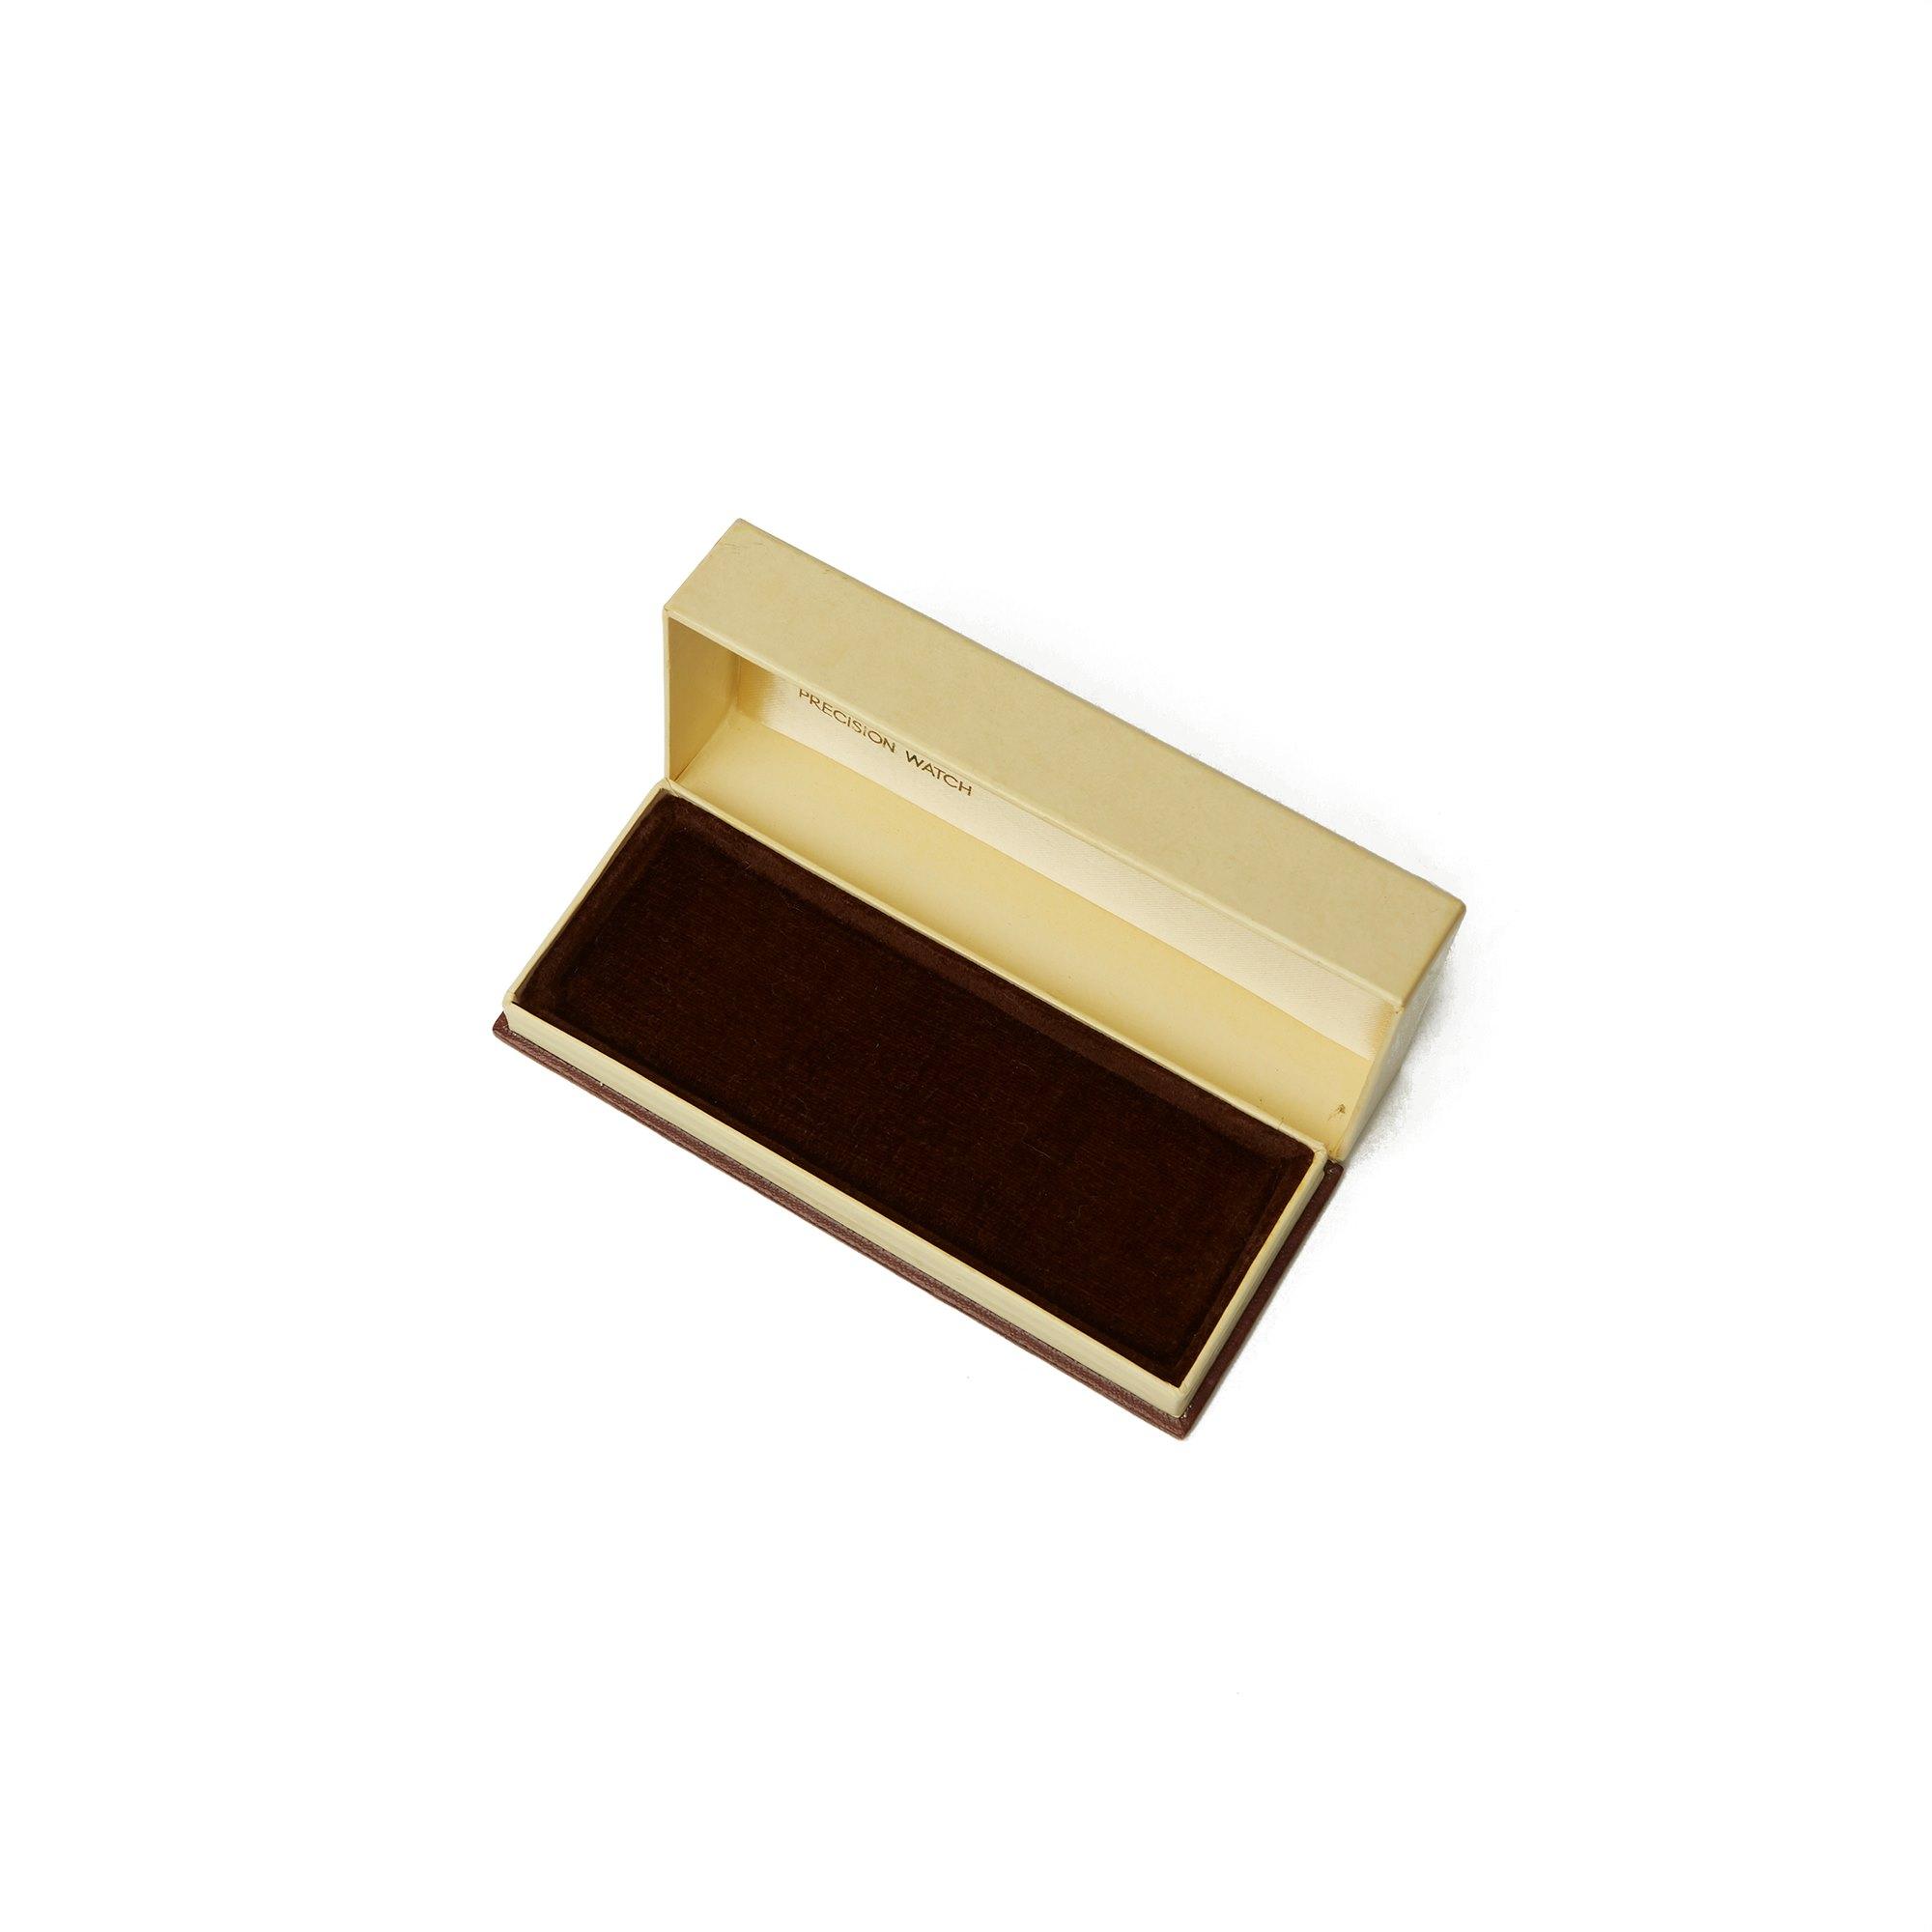 Omega Vintage 18k Yellow Gold 16270831